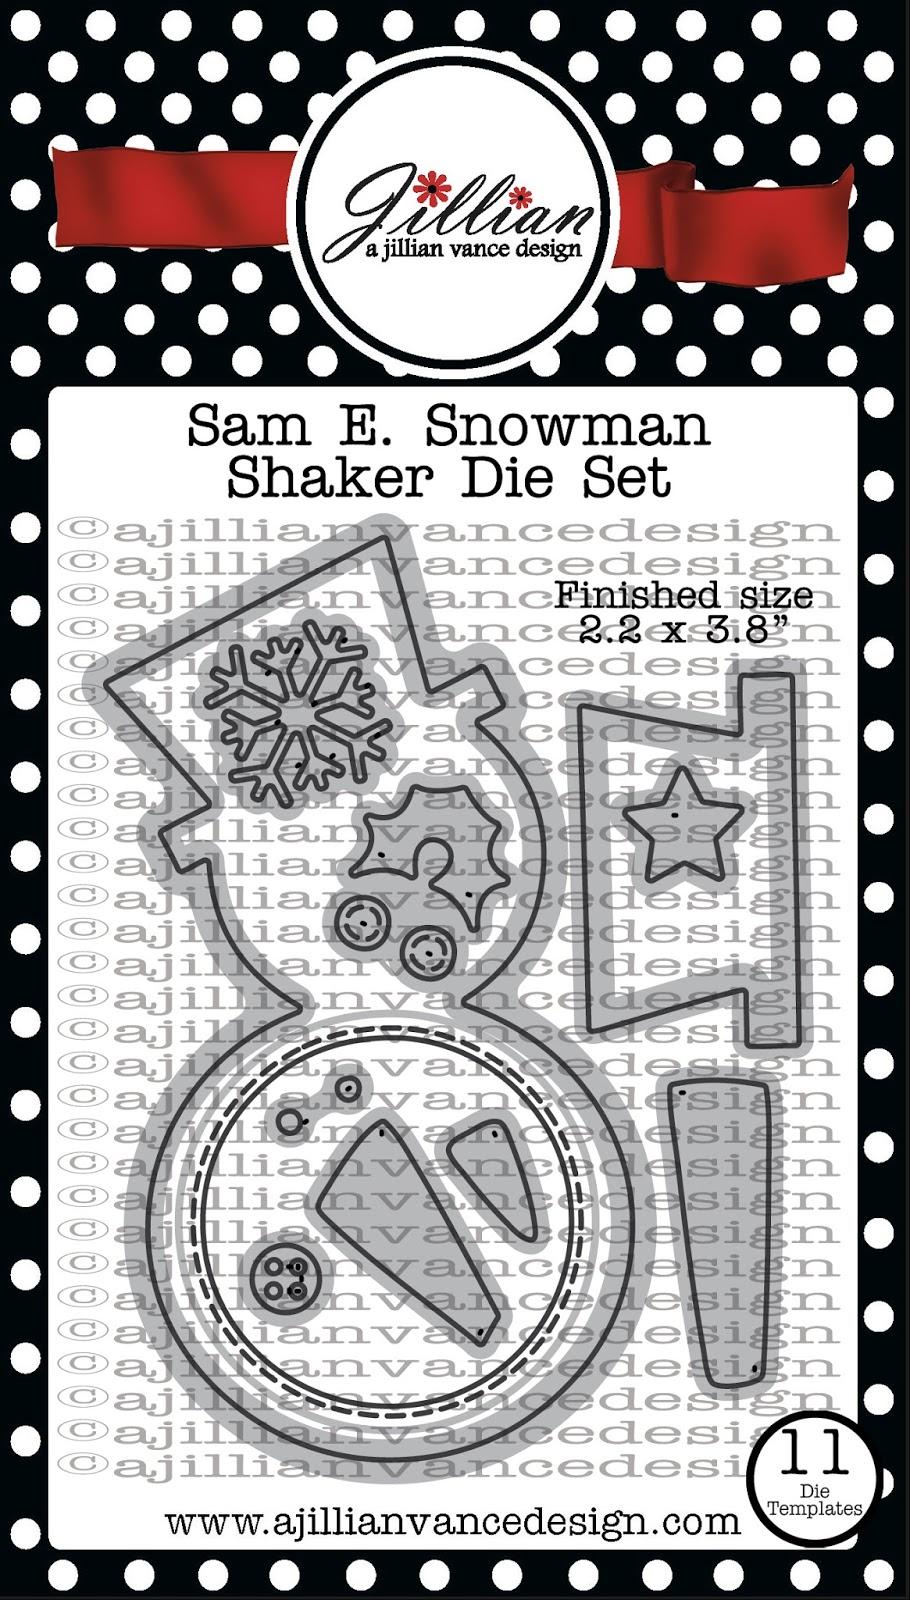 http://stores.ajillianvancedesign.com/sam-e-snowman-shaker-die-set/